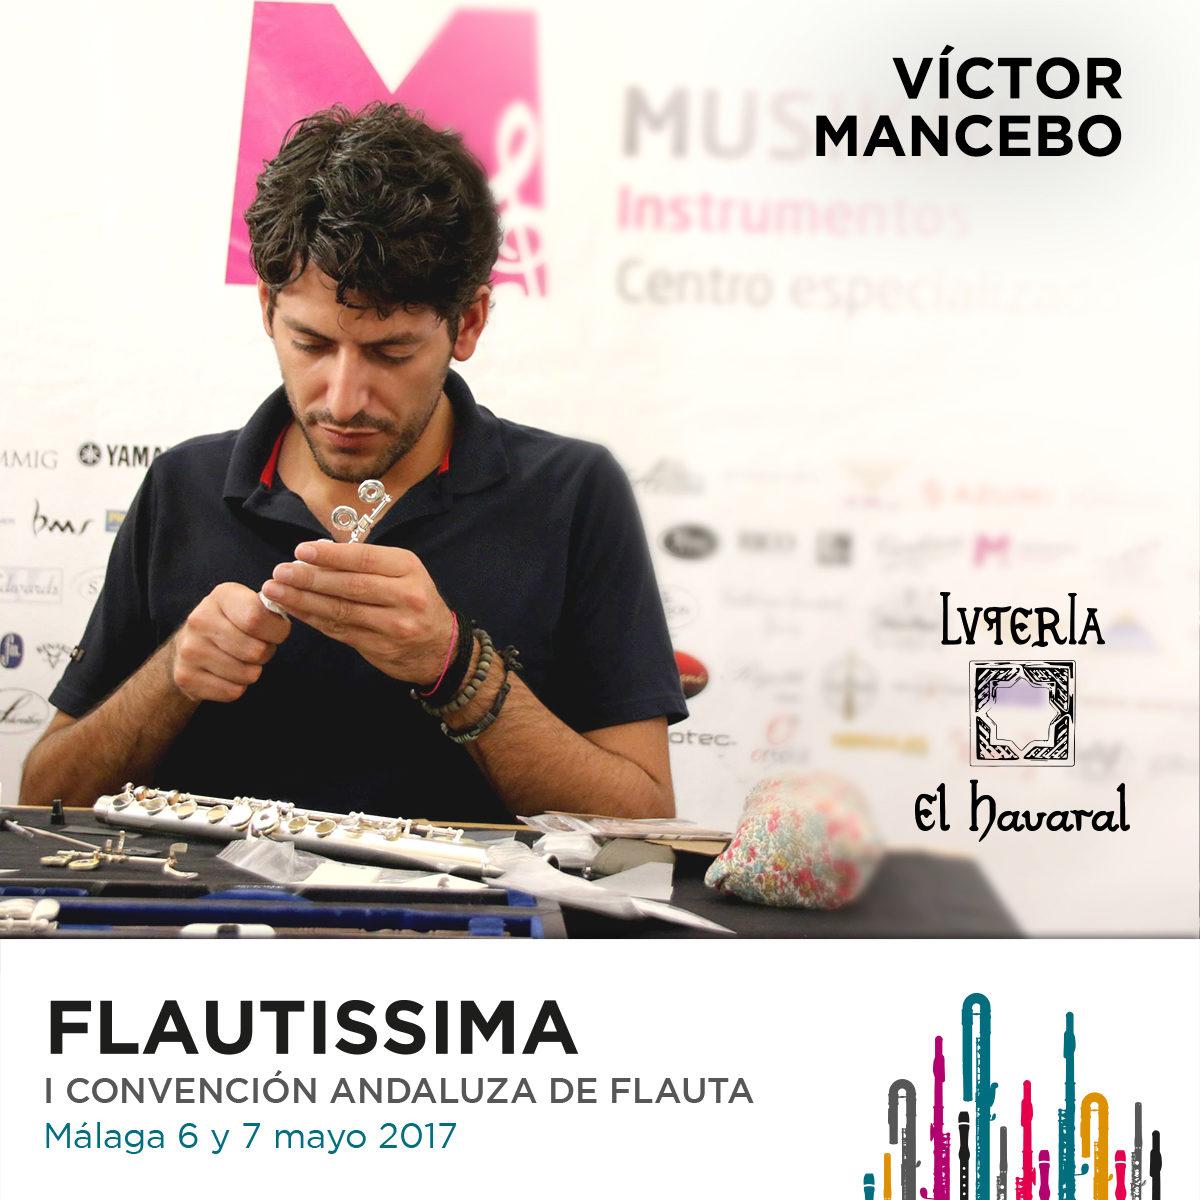 Víctor Mancebo El Havaral Flautissima